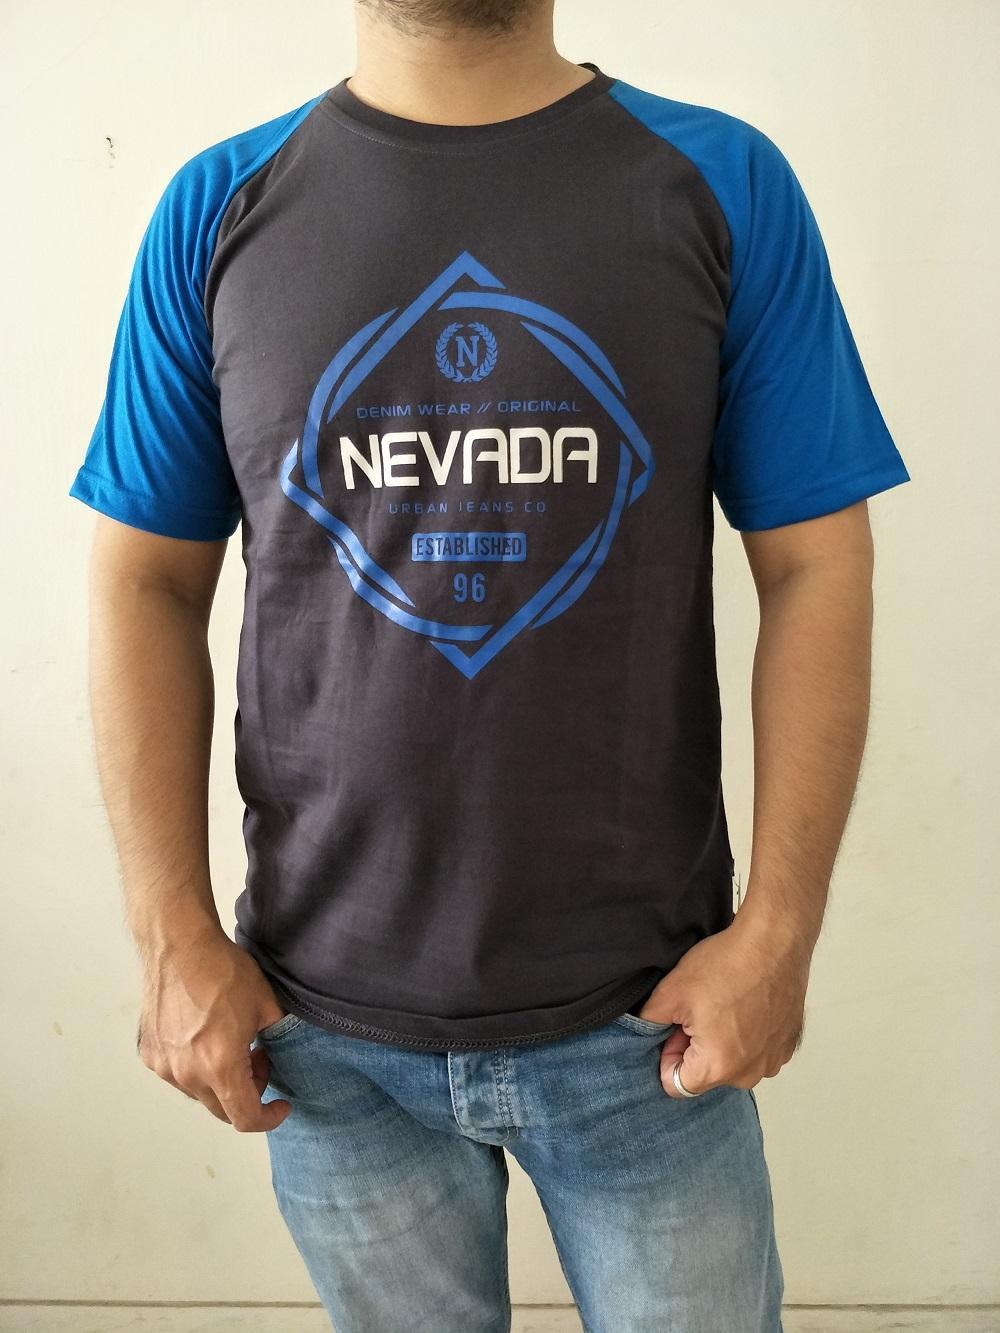 248 Kaos distro Nevada premium Quality TSHIRT PRIA / RAGLAN / KAOS PRIA / KAOS BRANDED ORIGINAL MATAHARI